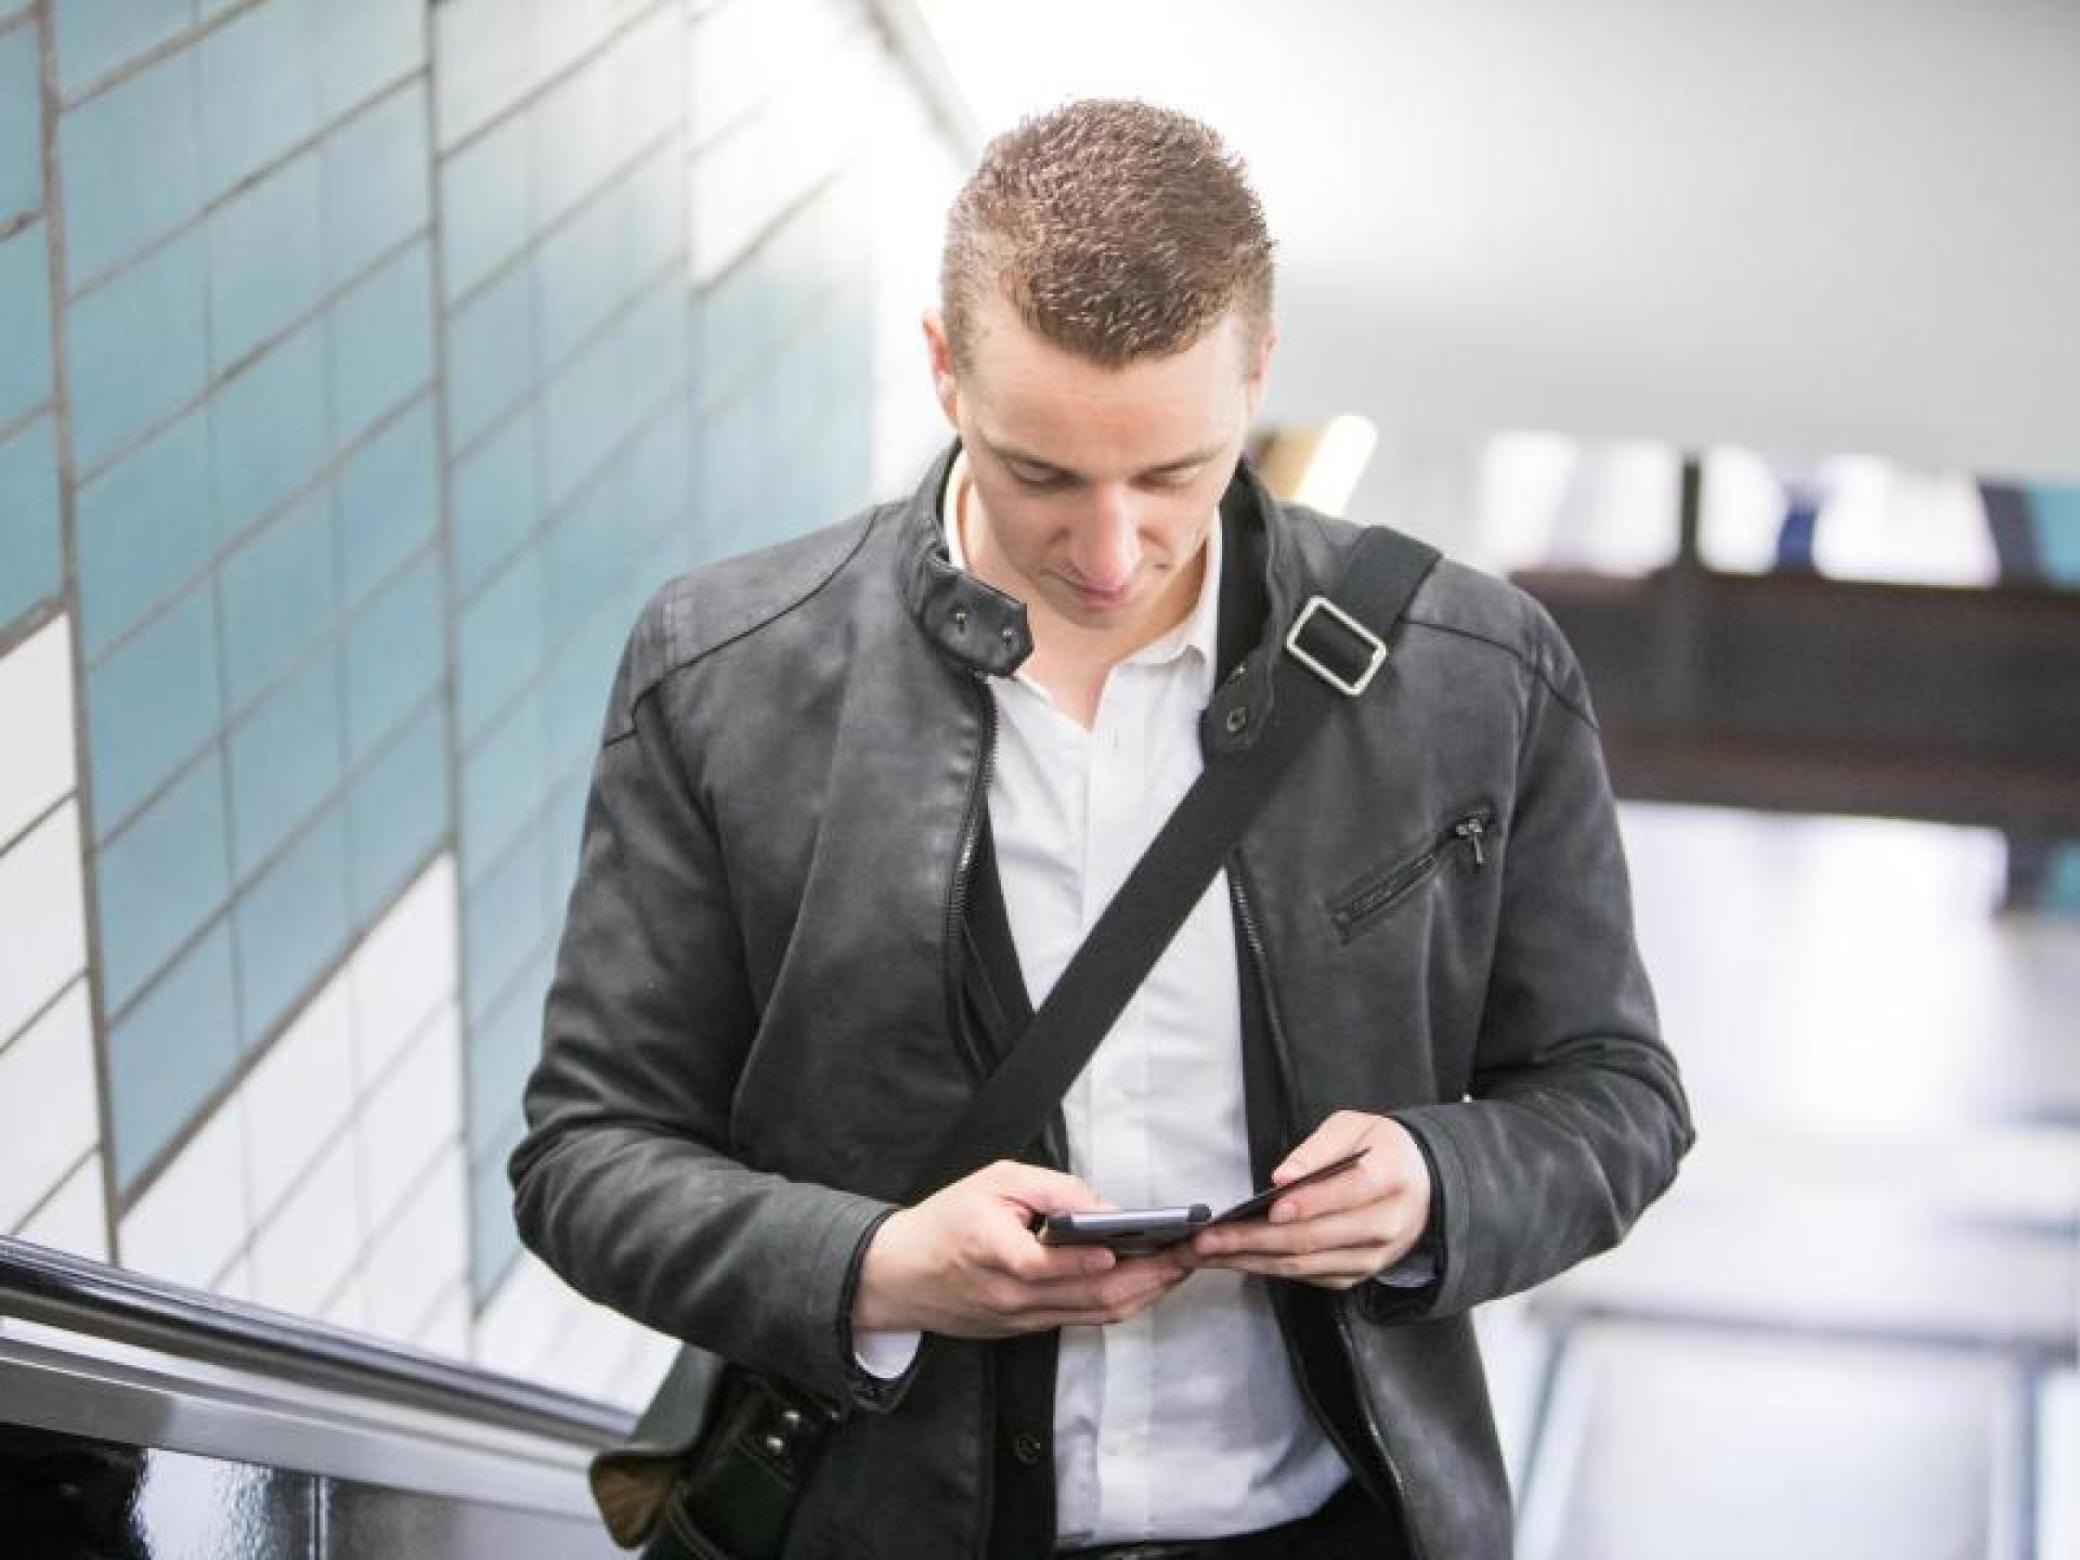 Effektive Tipps gegen den Handy-Nacken